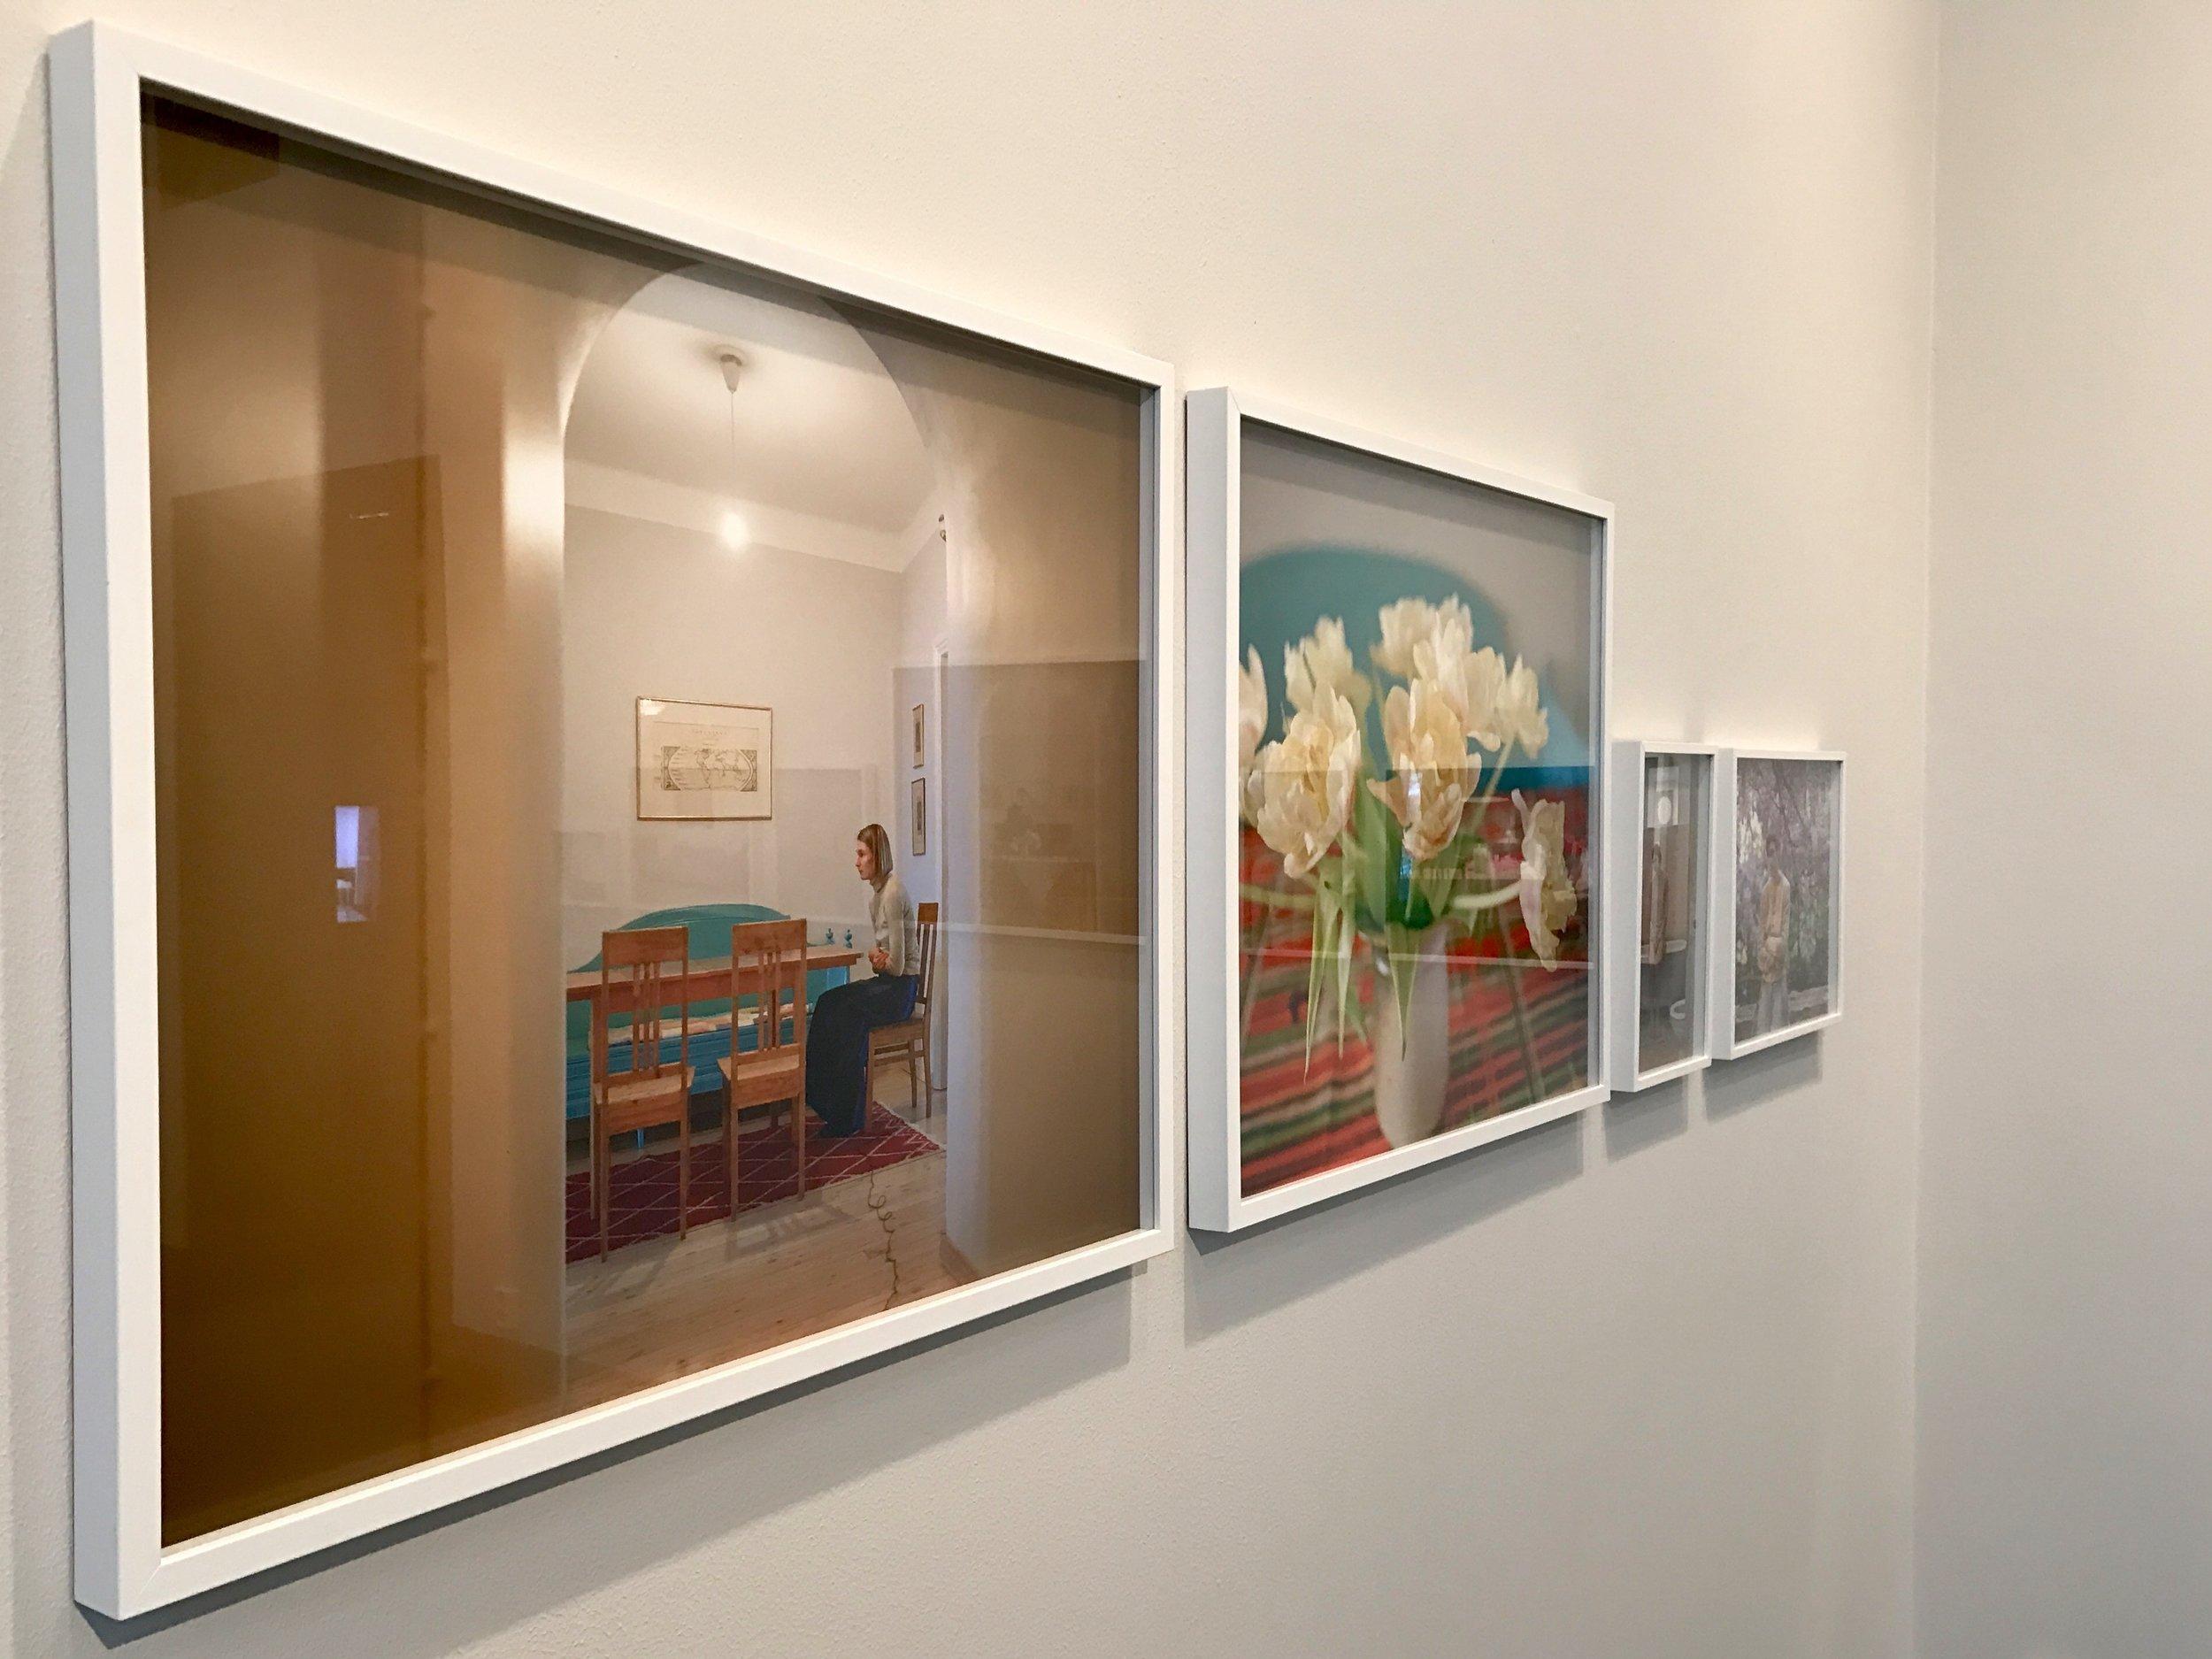 Annonciation (2009) ja Tulips (2009), sarjasta Annonciation 2009-2013. Pigmenttimustevedos.